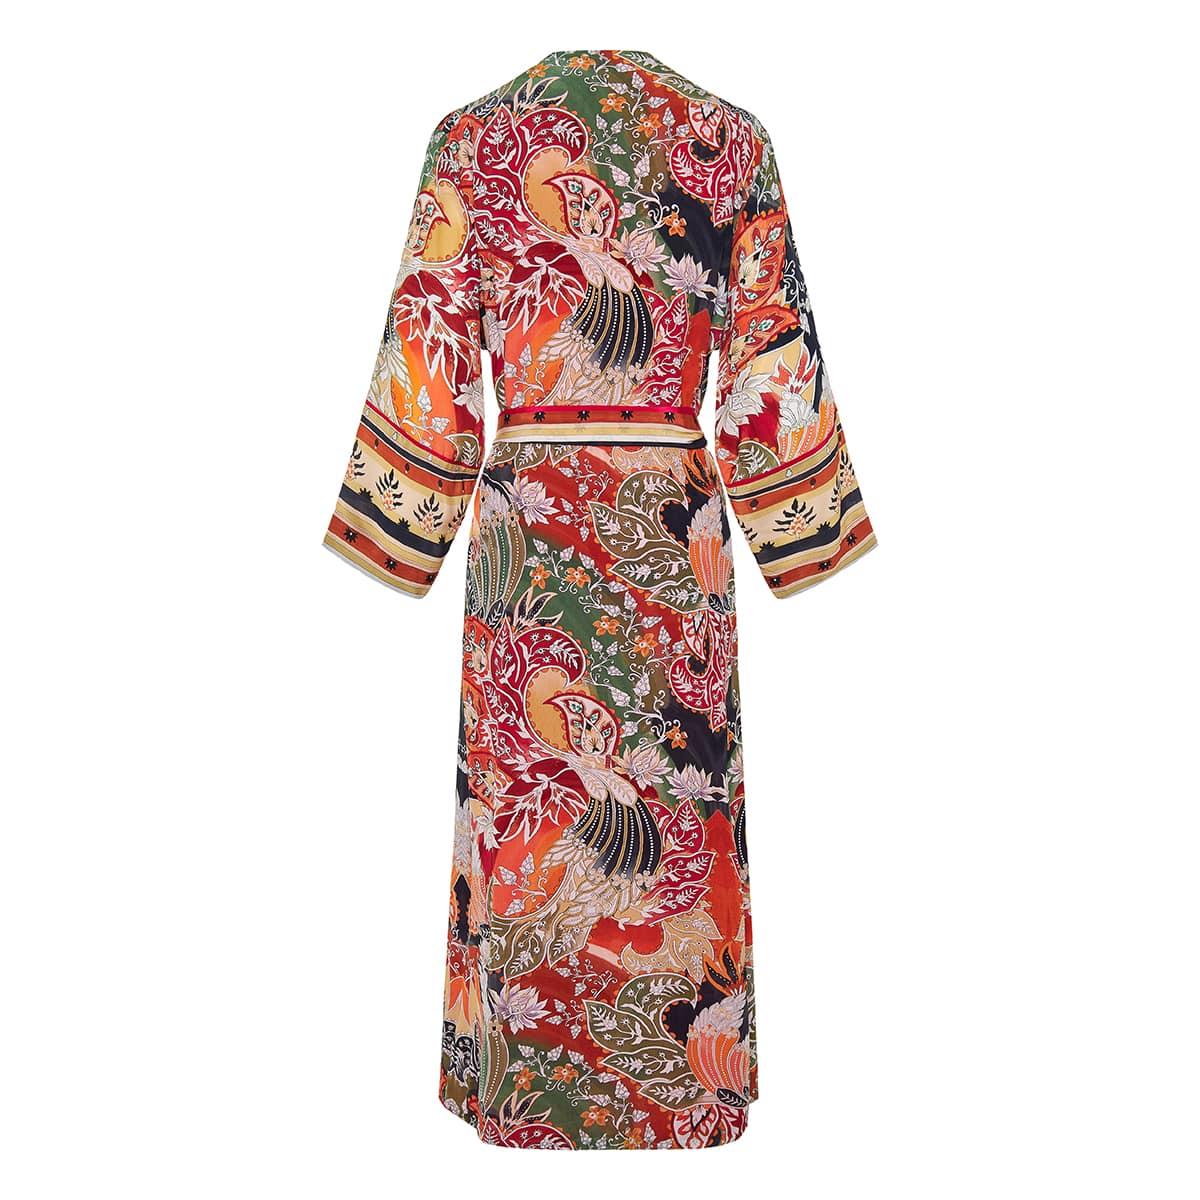 Dampa printed long robe dress